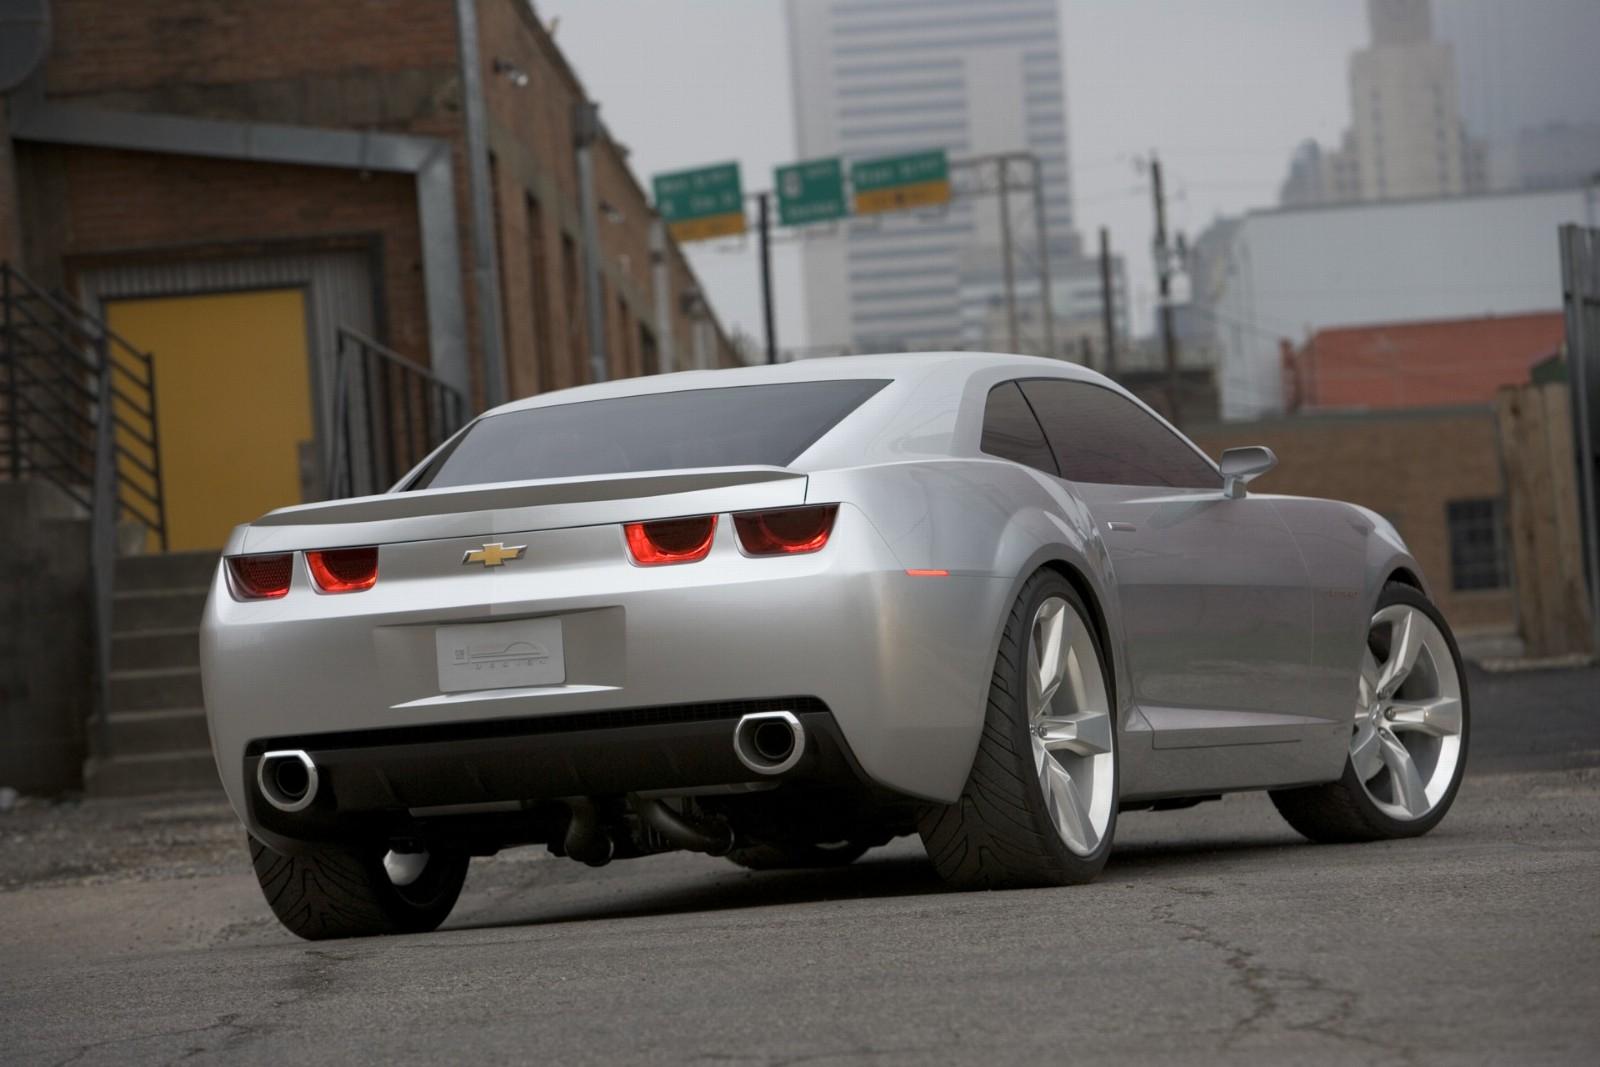 2006 Chevrolet Camaro Concept Image Https Www